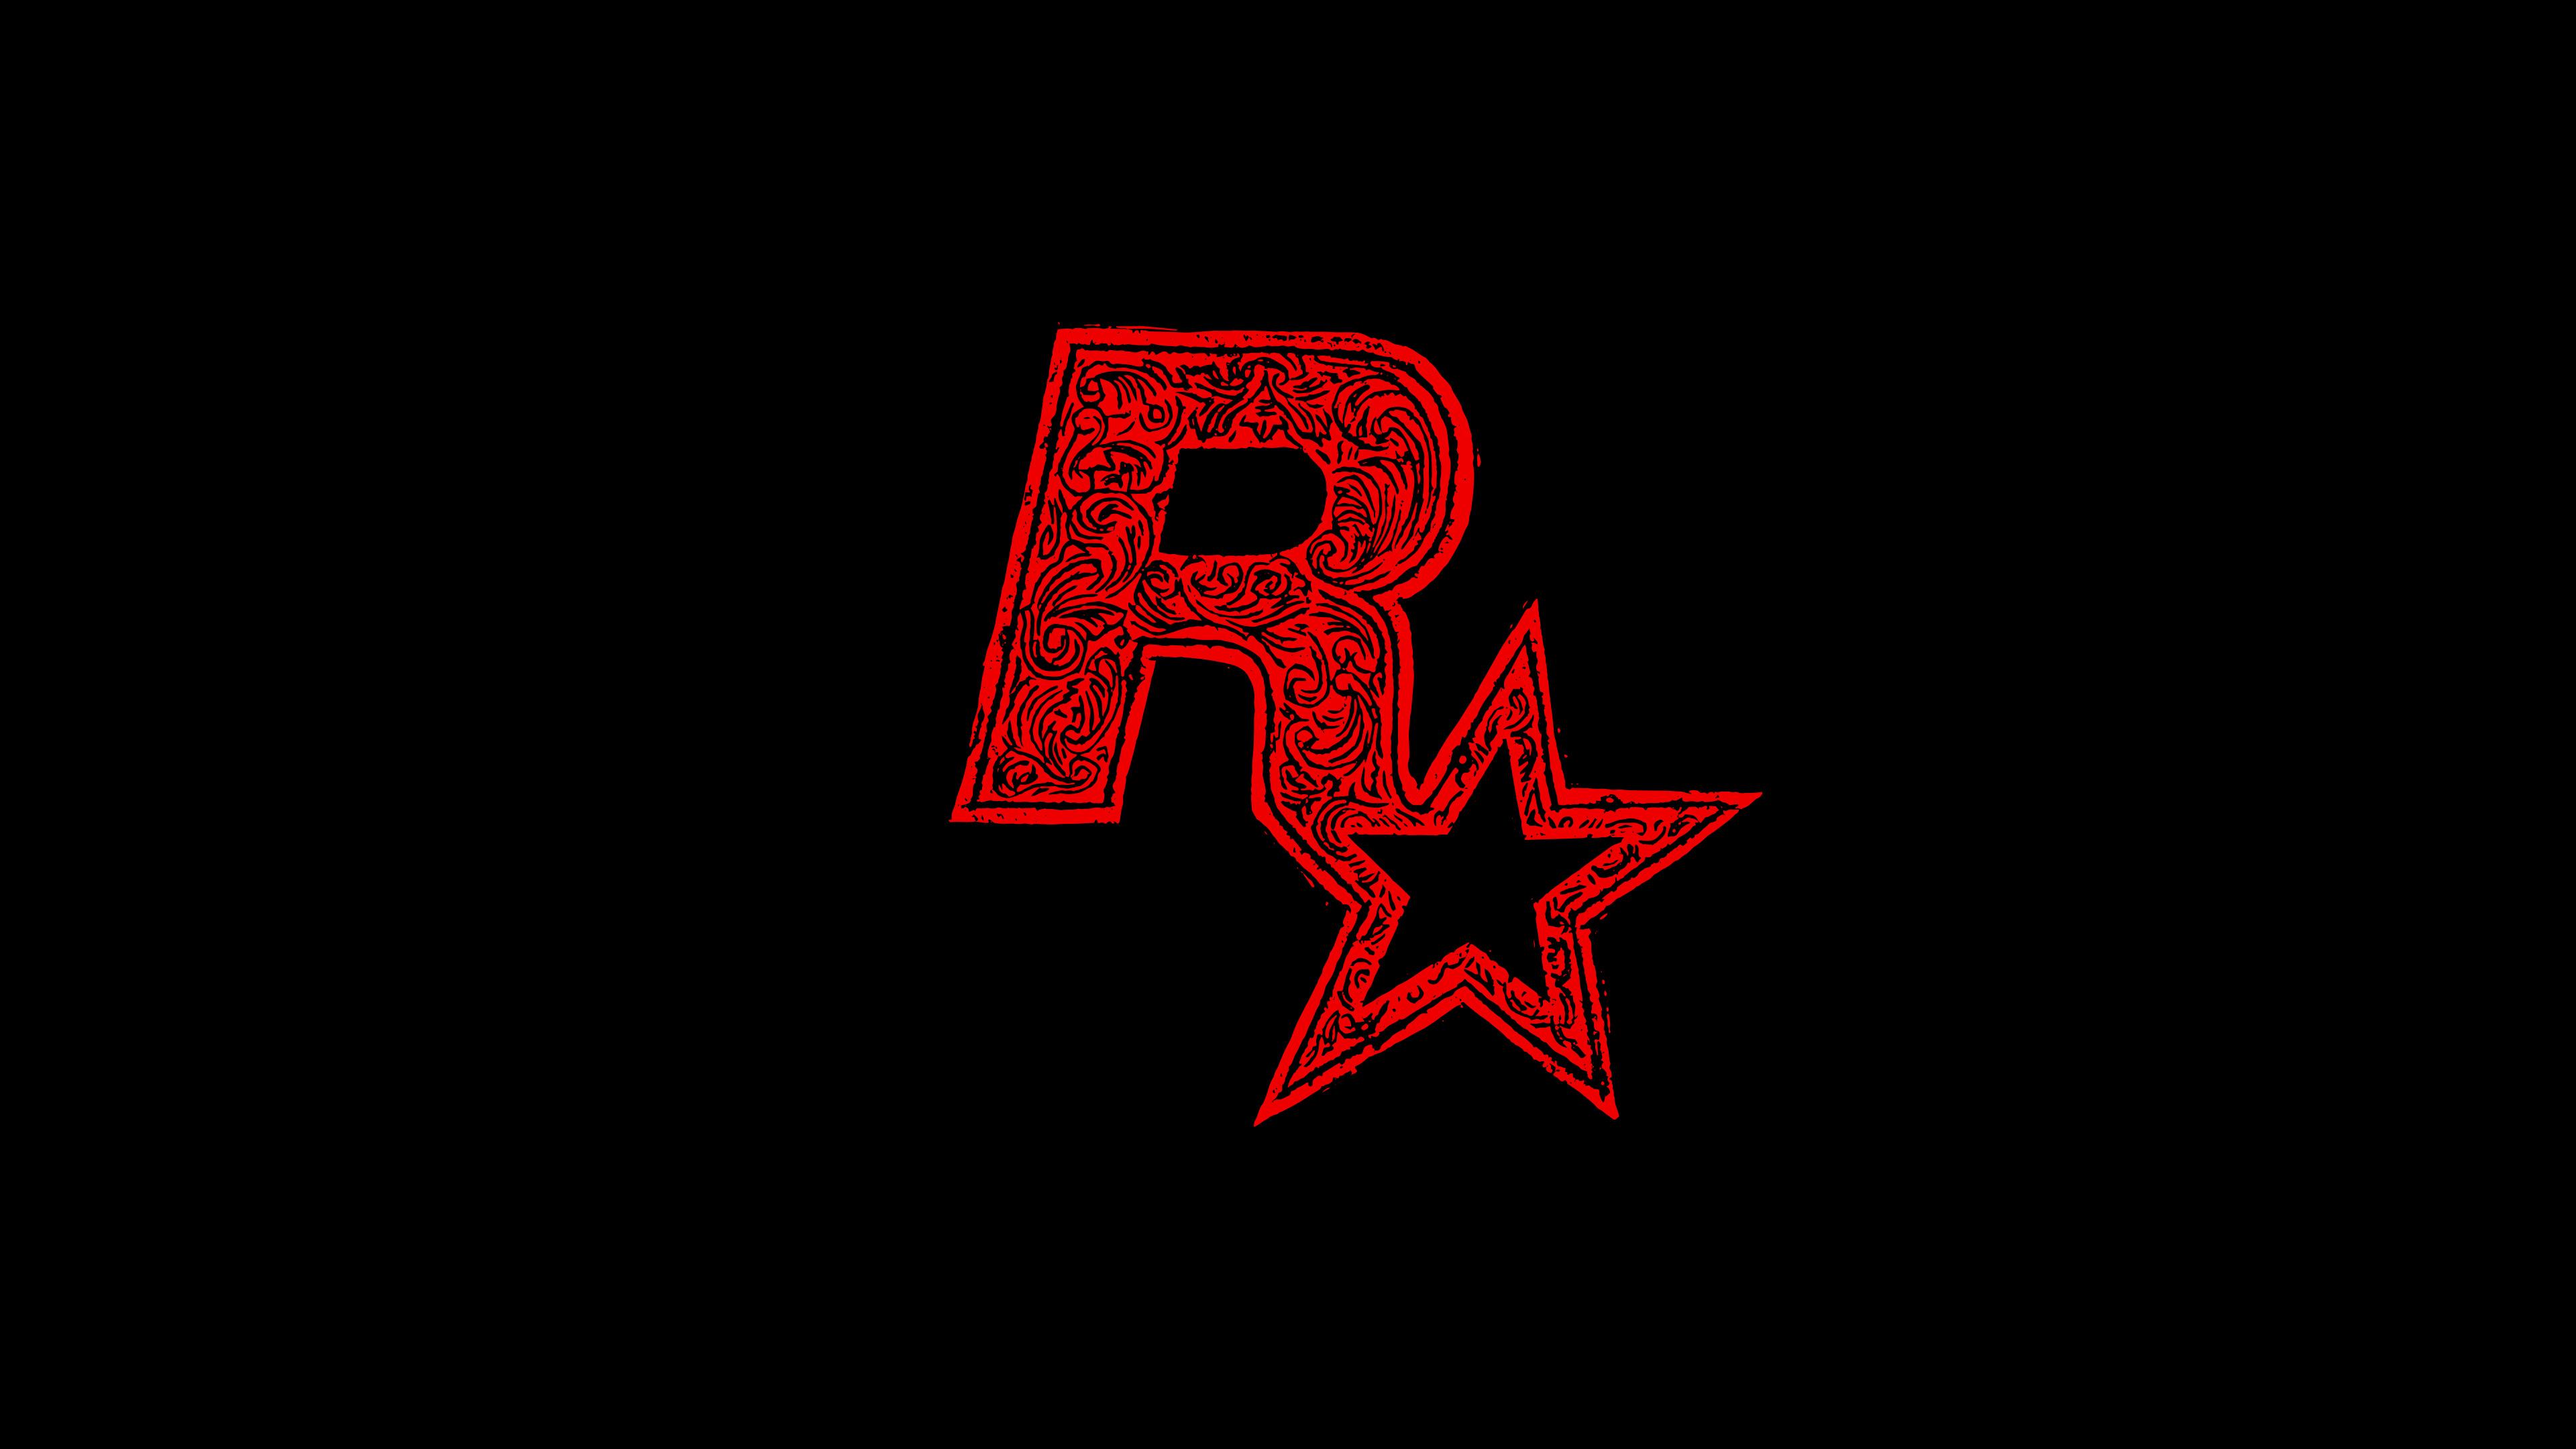 rdr2_tshirt_linocut_solid_desktop.jpg